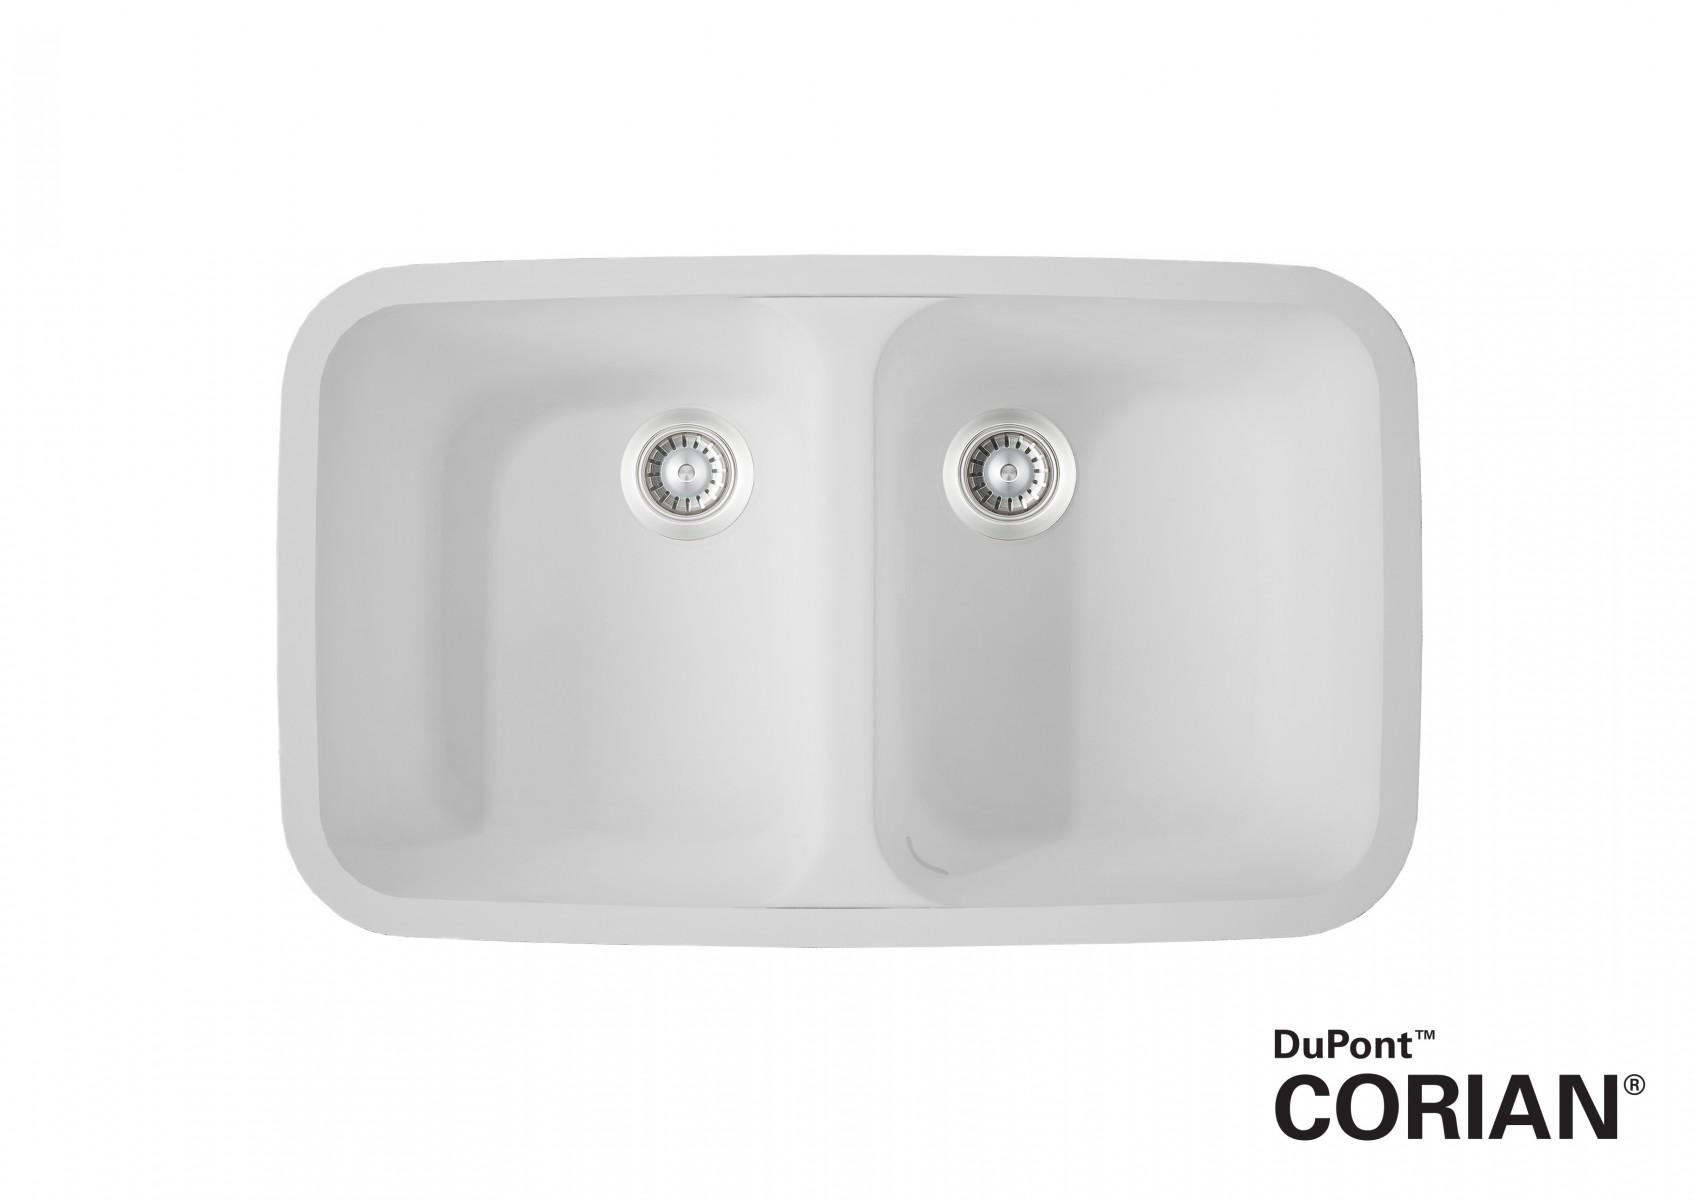 corian smooth 850 rh counterproduction co uk